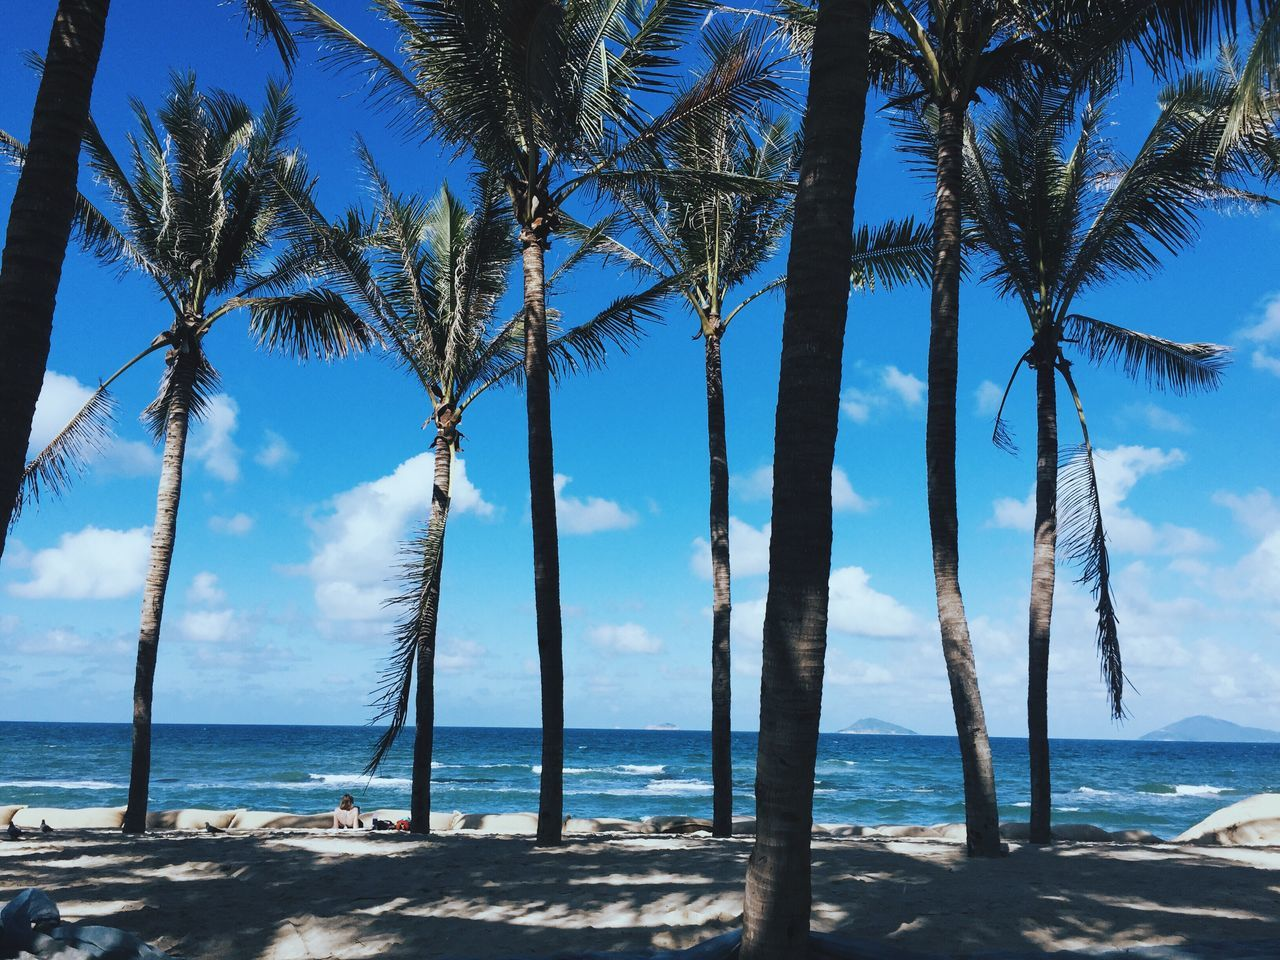 The Great Outdoors - 2017 EyeEm Awards Beach Vitaminsea Hoi An Vietnam Nature Blue Relaxing Water